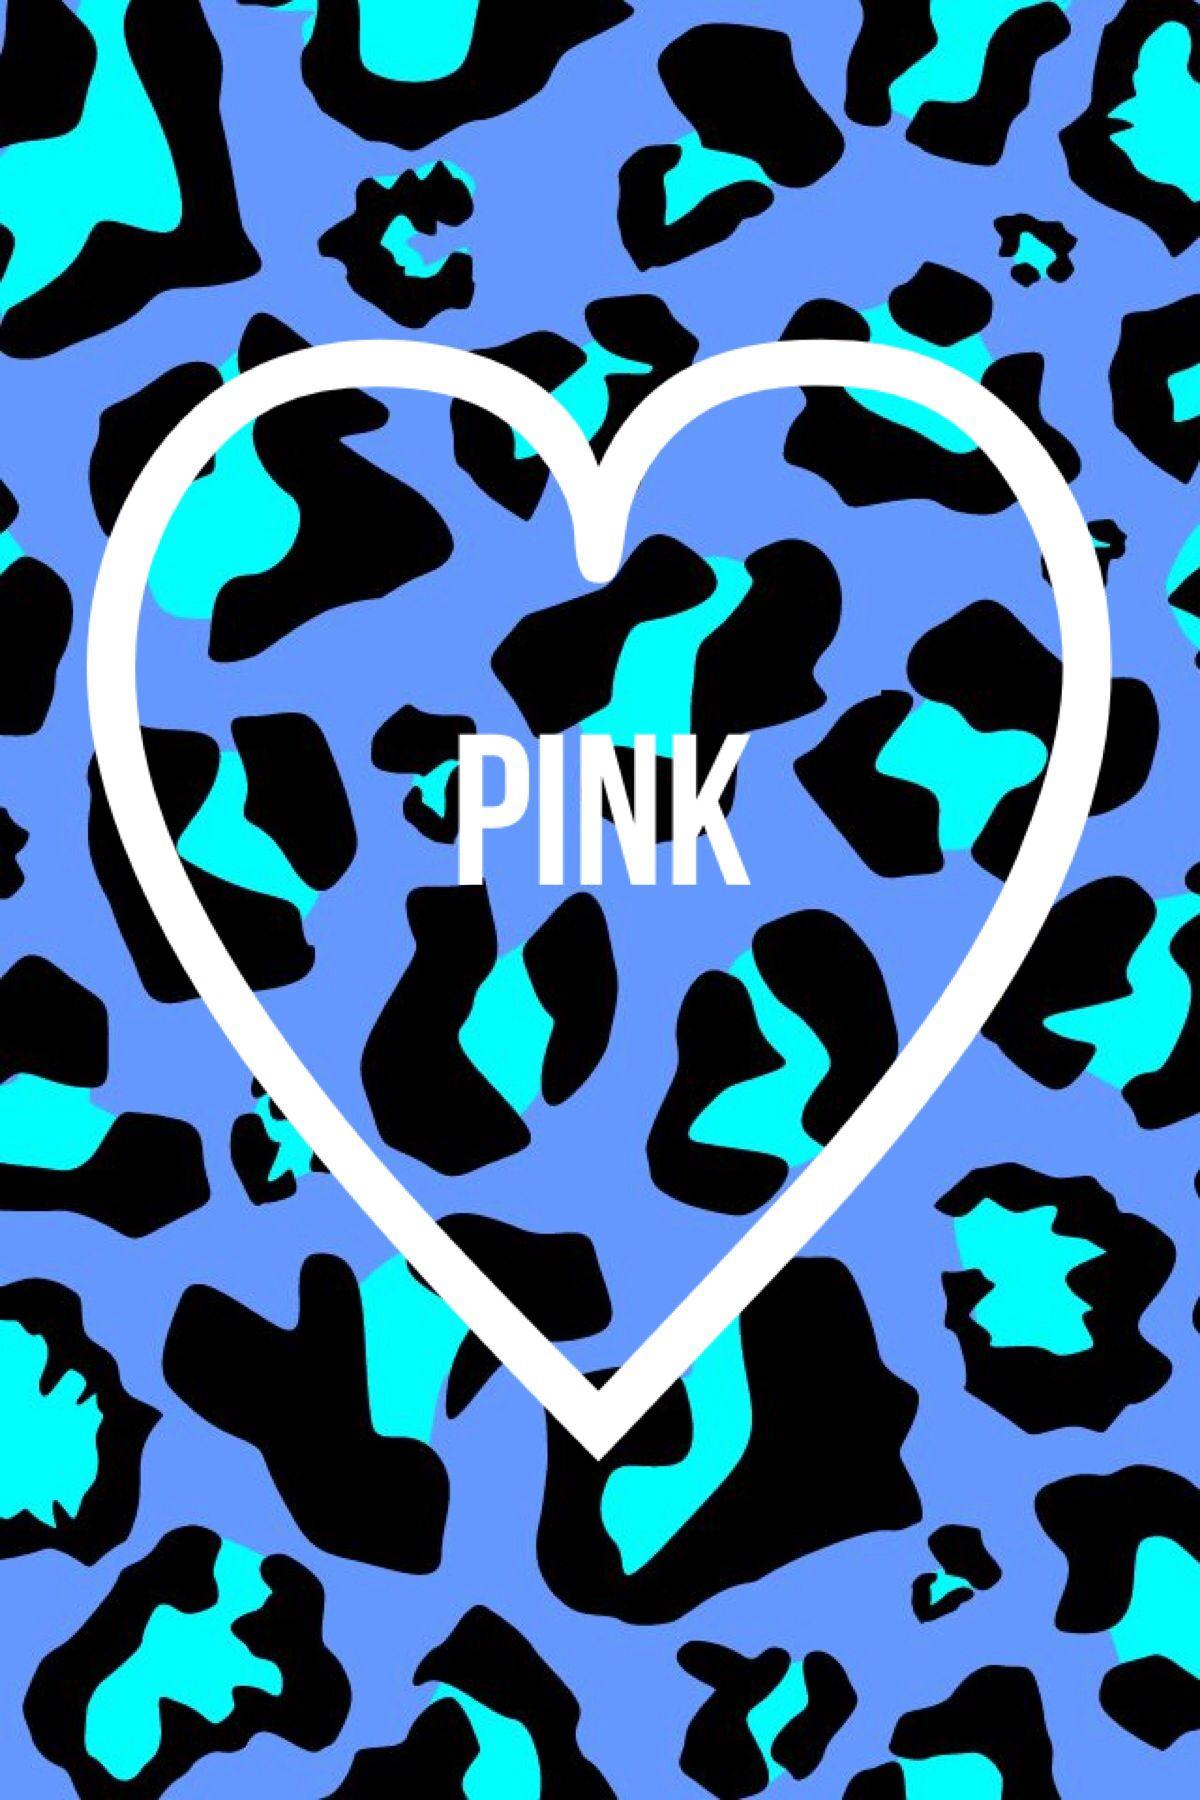 Vs Wallpaper I Created Pink Nation Wallpaper Vs Pink Wallpaper Victoria Secret Wallpaper